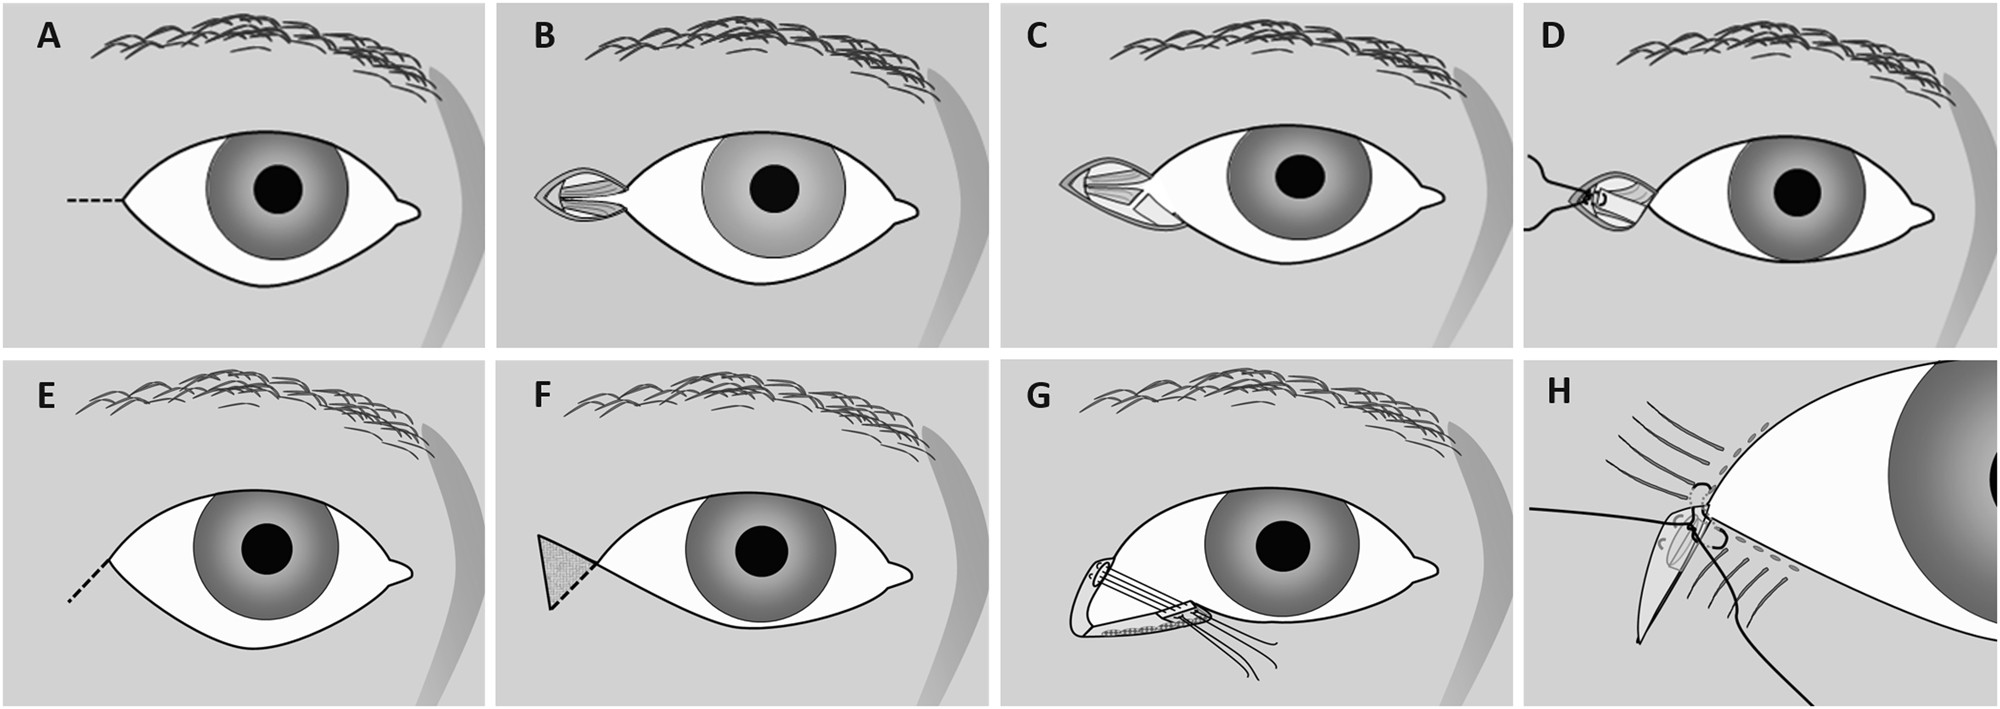 Lateral Tarsal Strip Versus Bicks Procedure In Correction Of Eyelid Jacquelle Eyebrow Scissors Malposition Eye